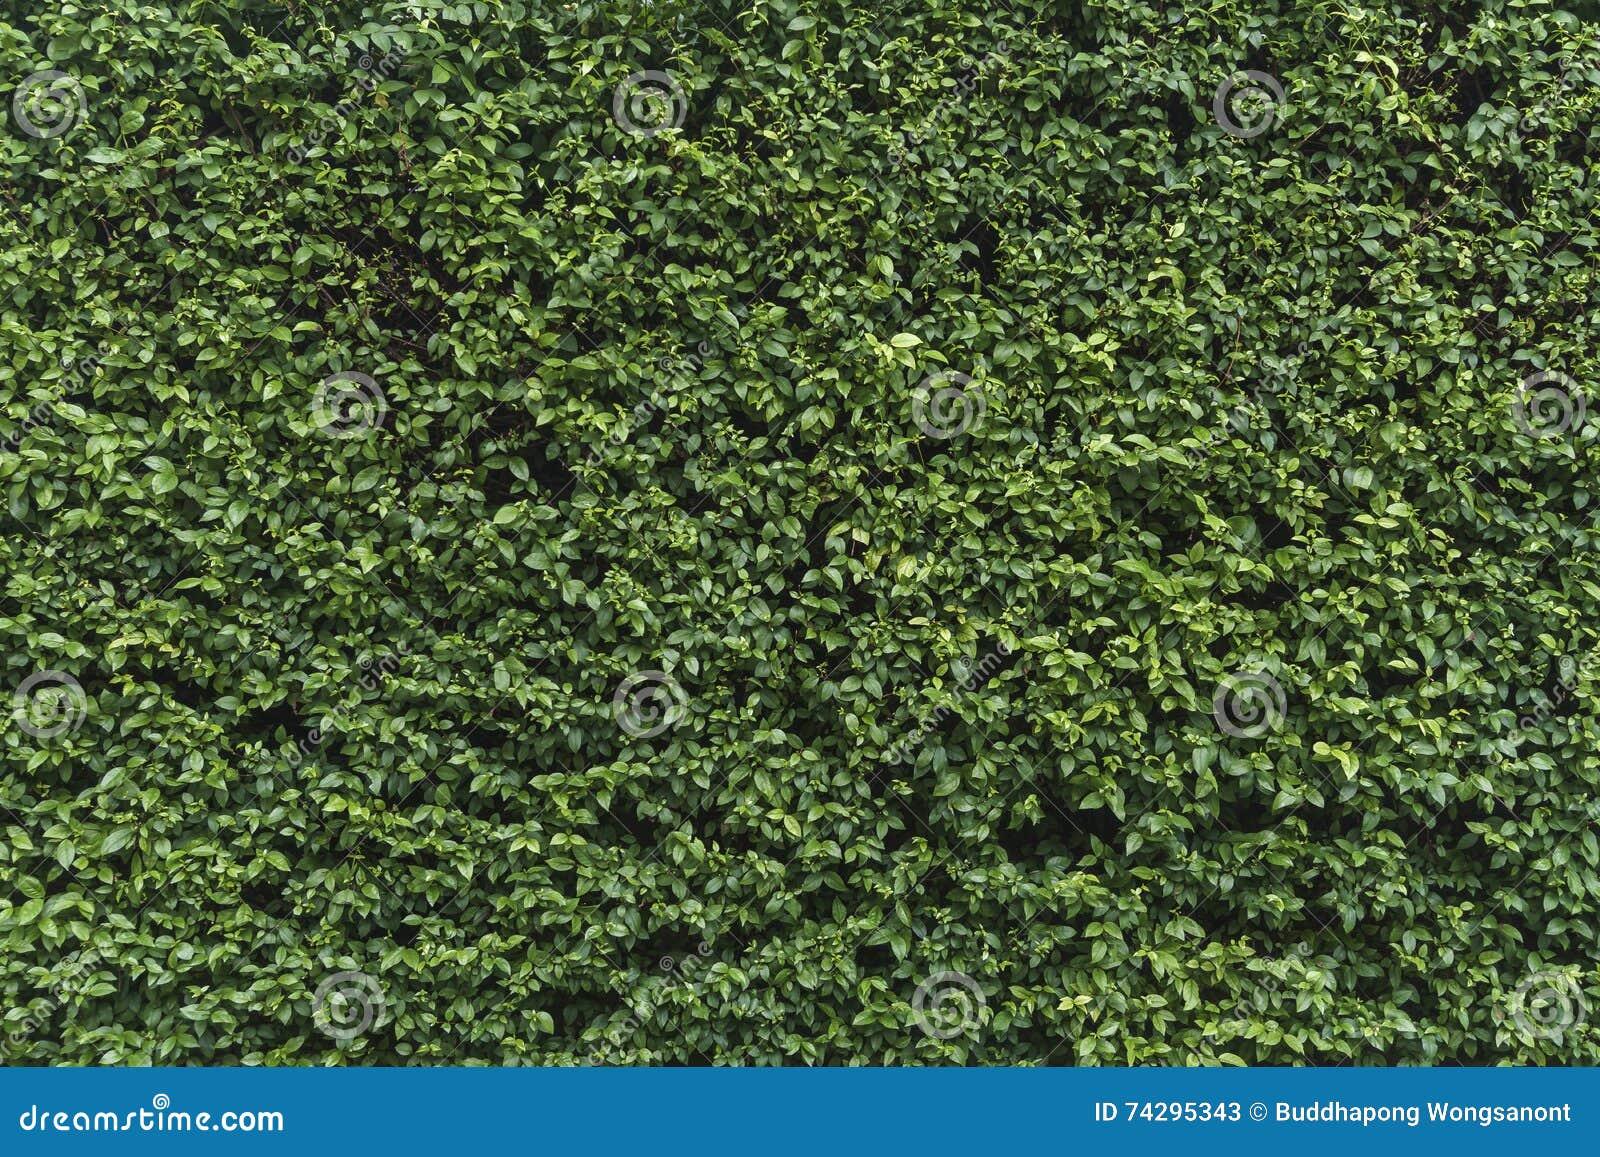 Green shrubbery wall.